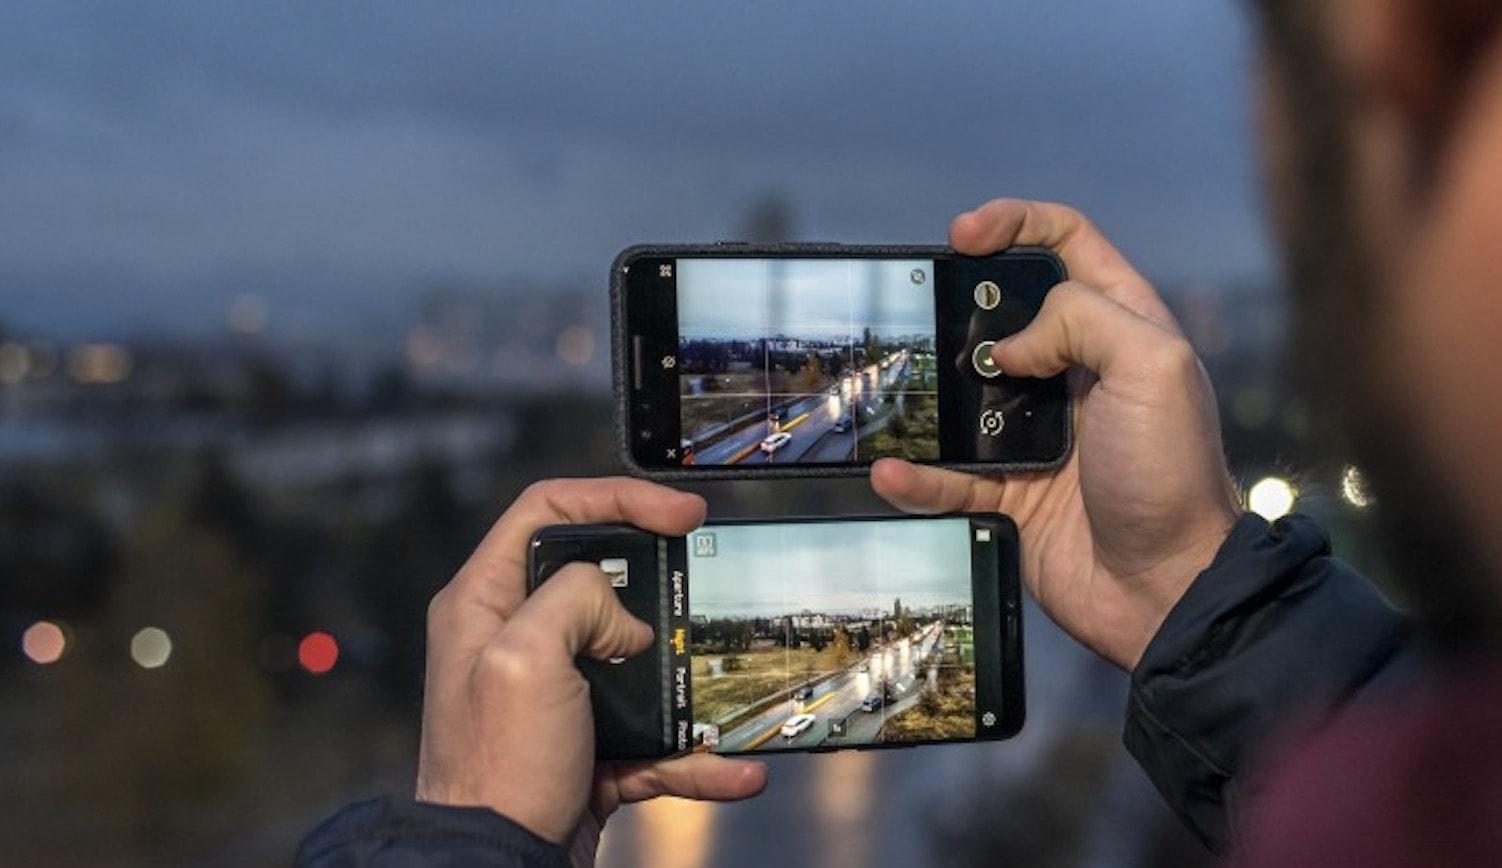 Pixel 3 vs Mate 20 Pro Gece Modu Kamera Karşılaştırması